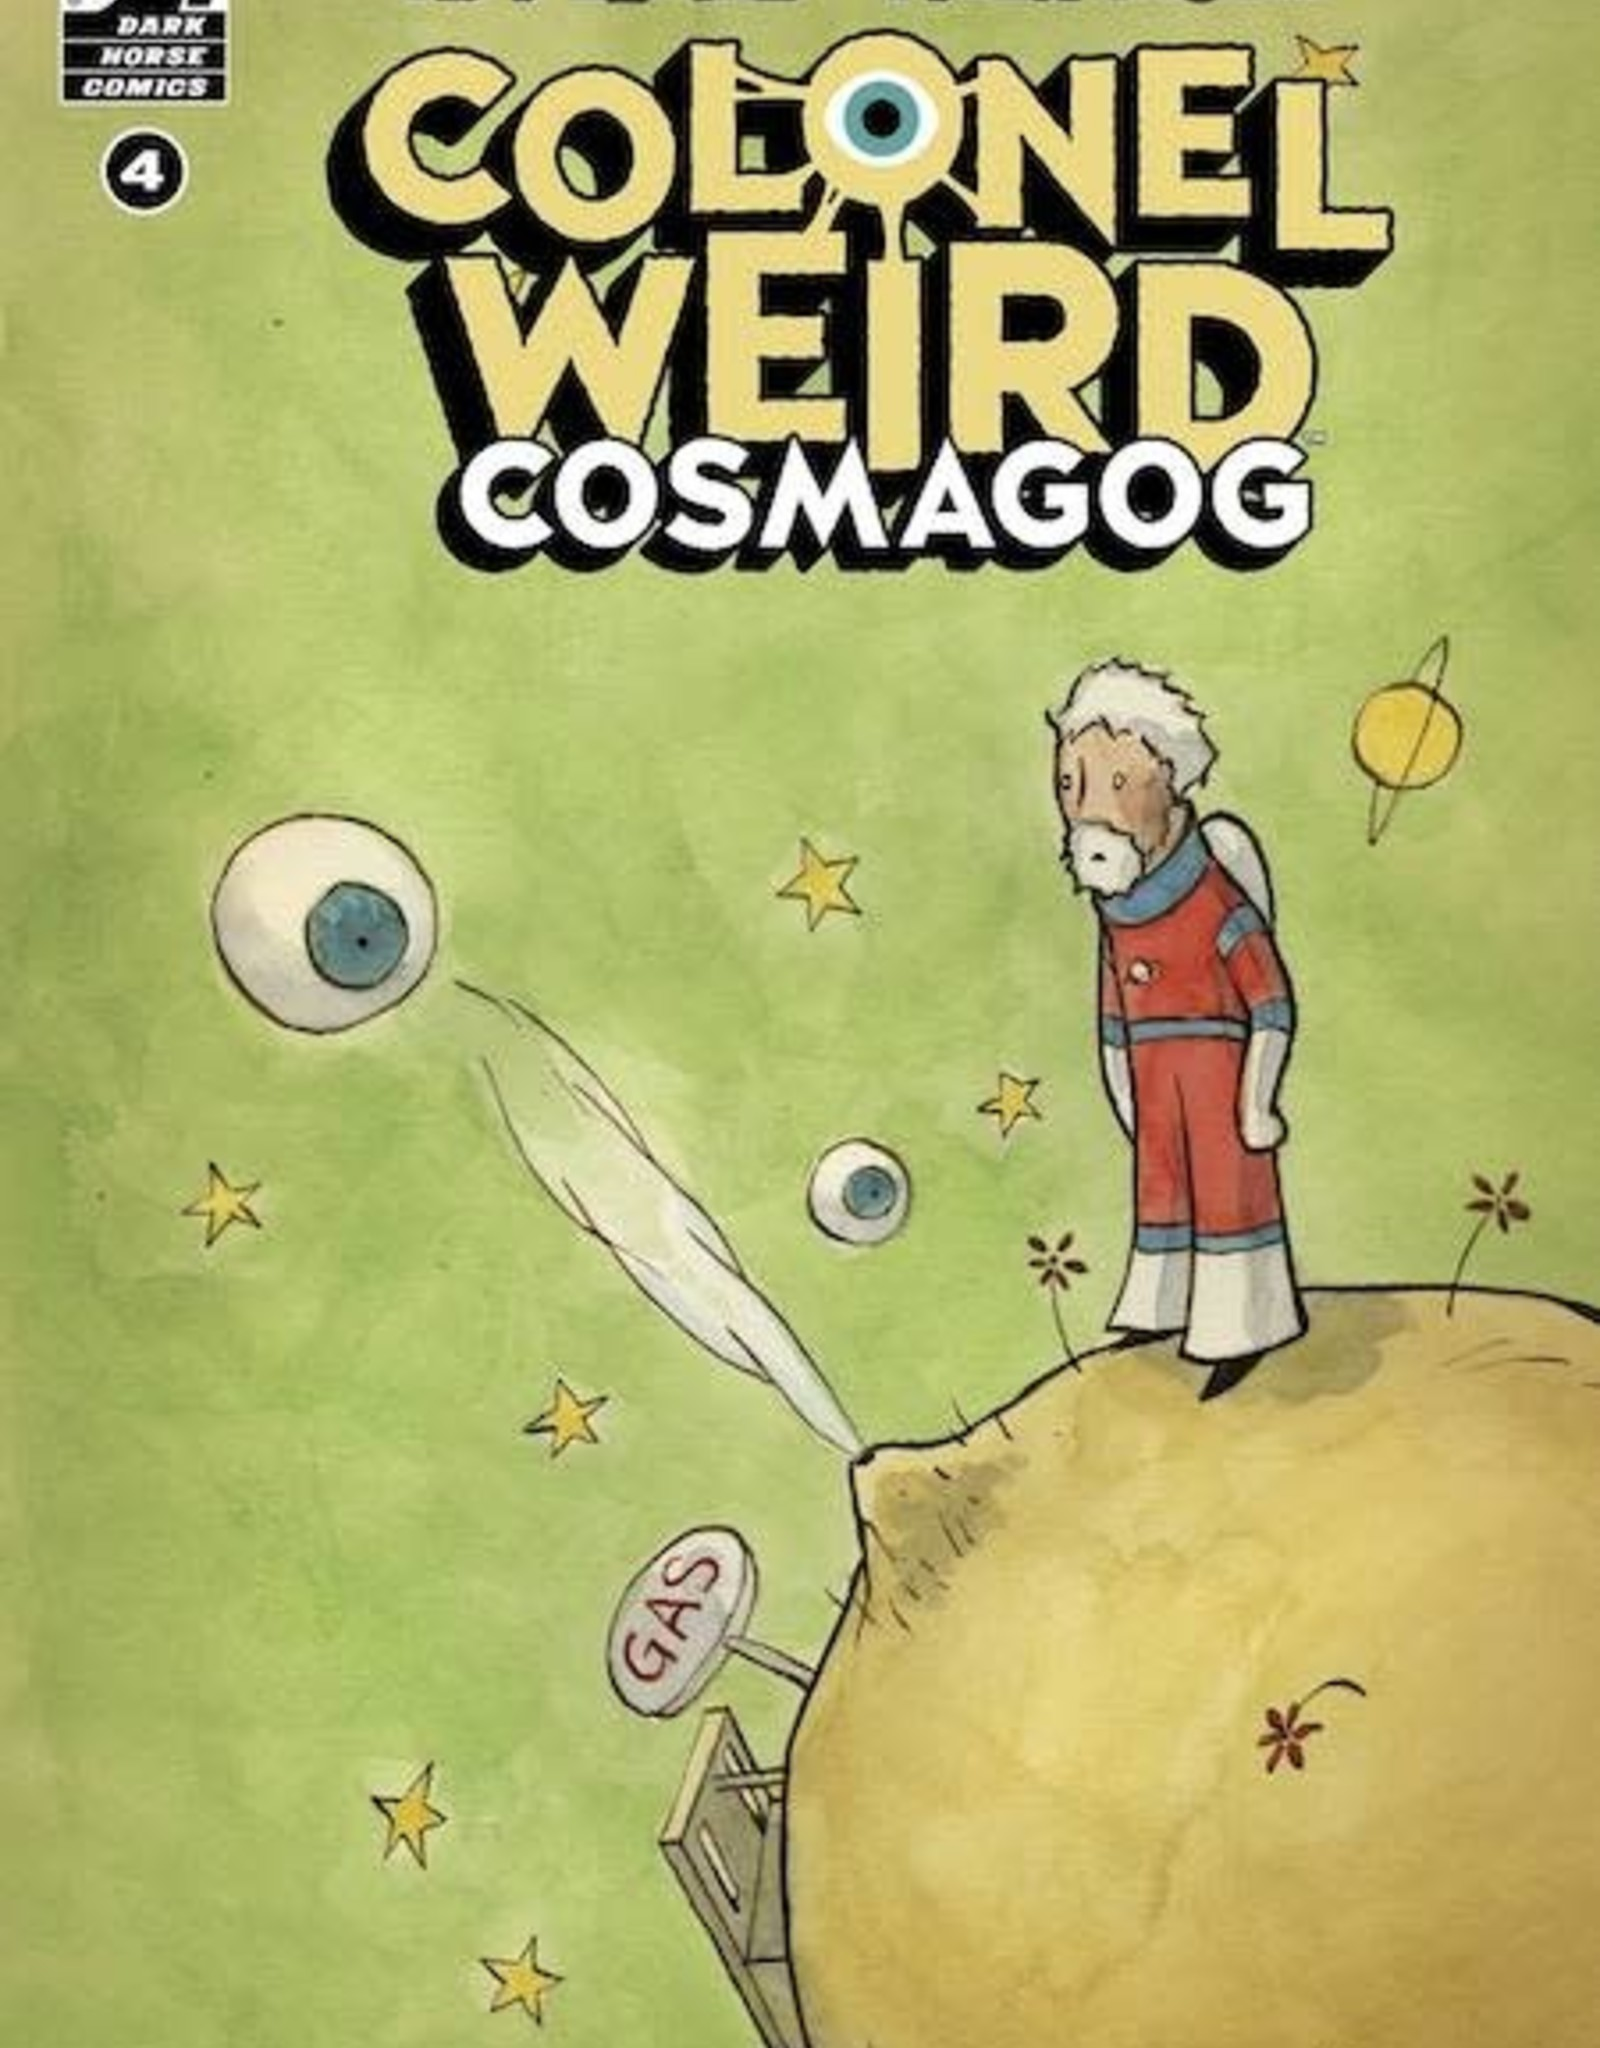 Dark Horse Comics Colonel Weird Cosmagog #4 Cvr A Crook